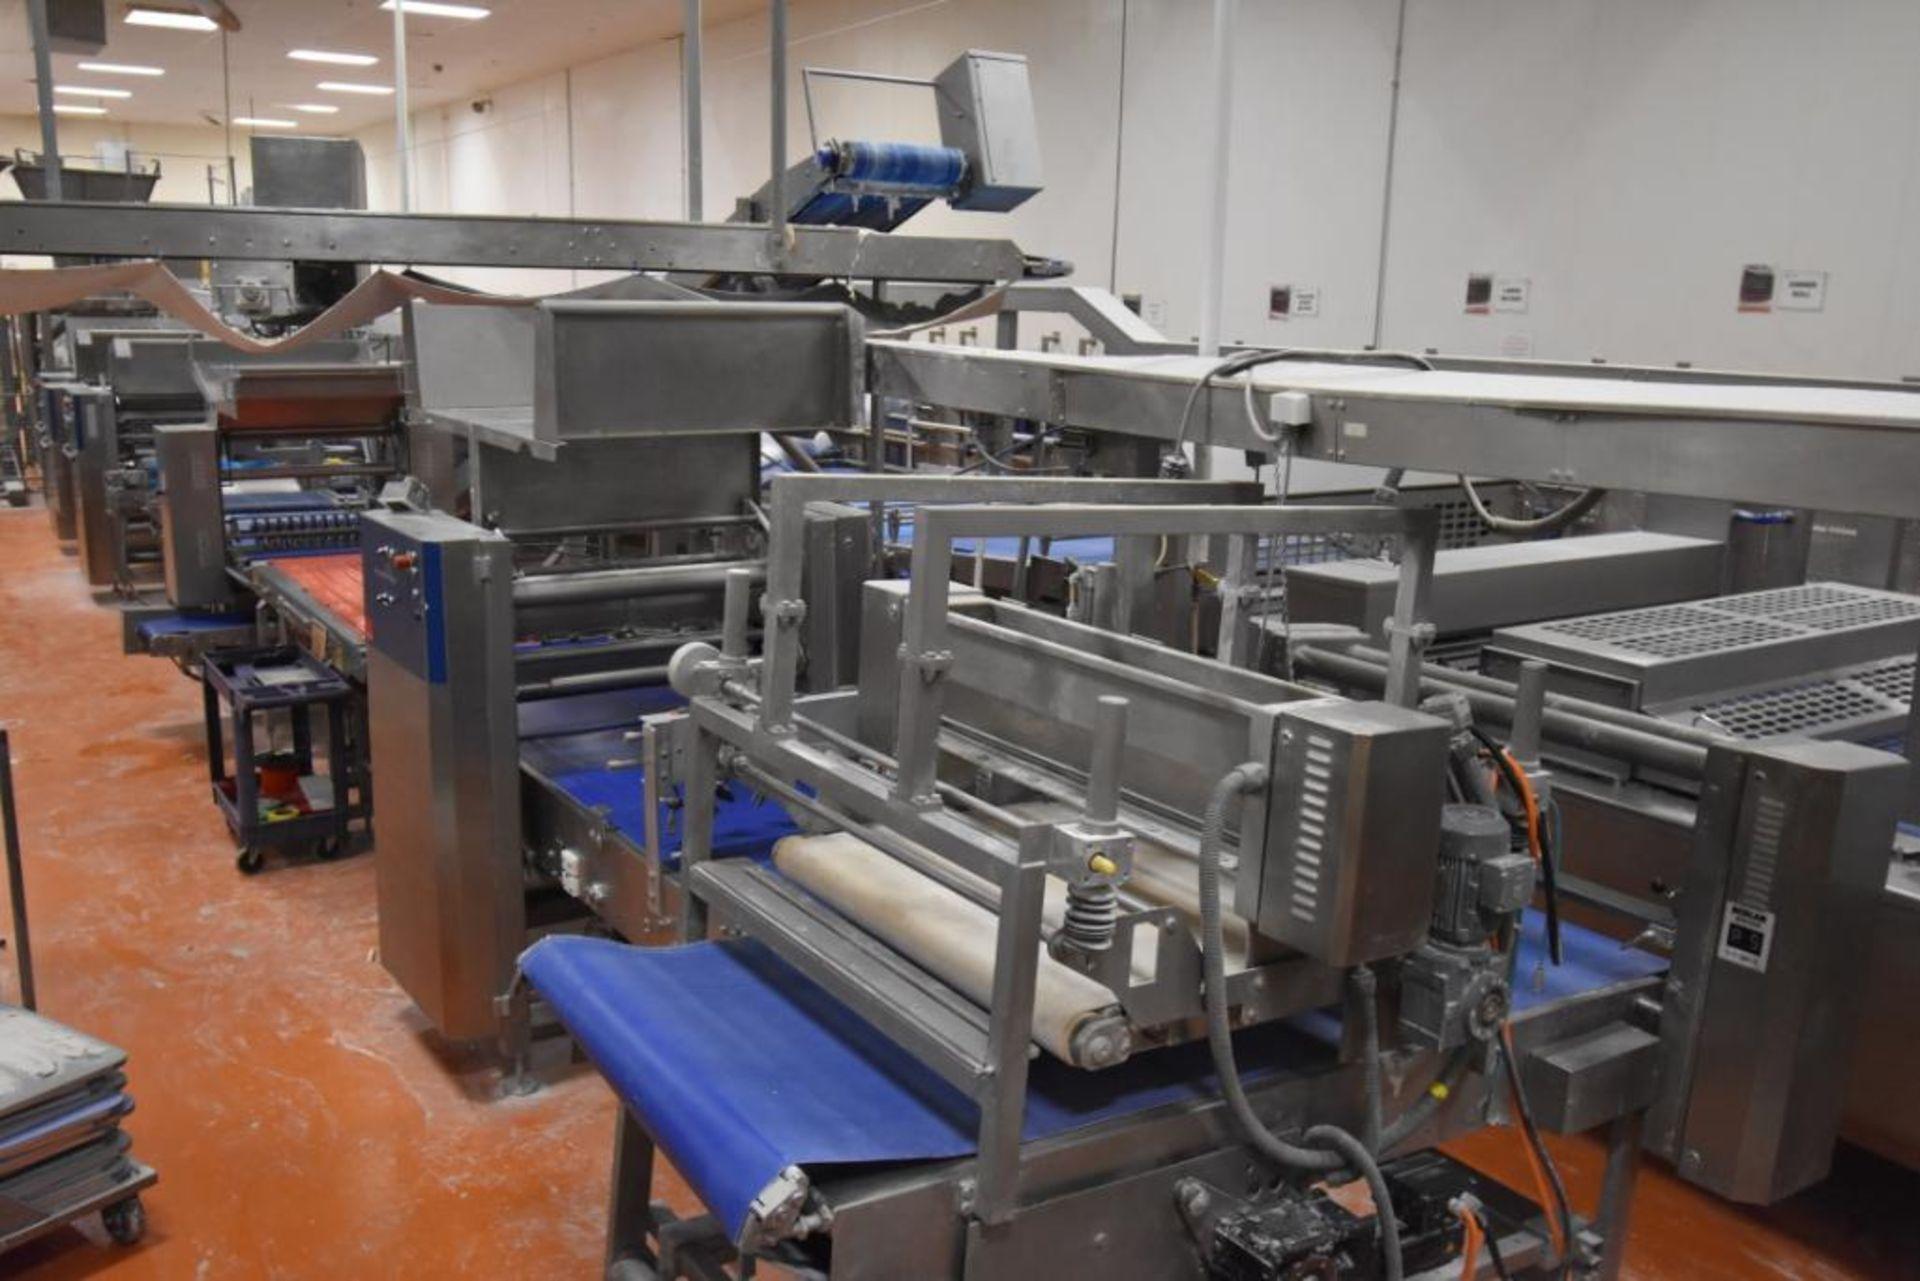 2007 Fritsch Laminator 3000 dough line - Image 236 of 280